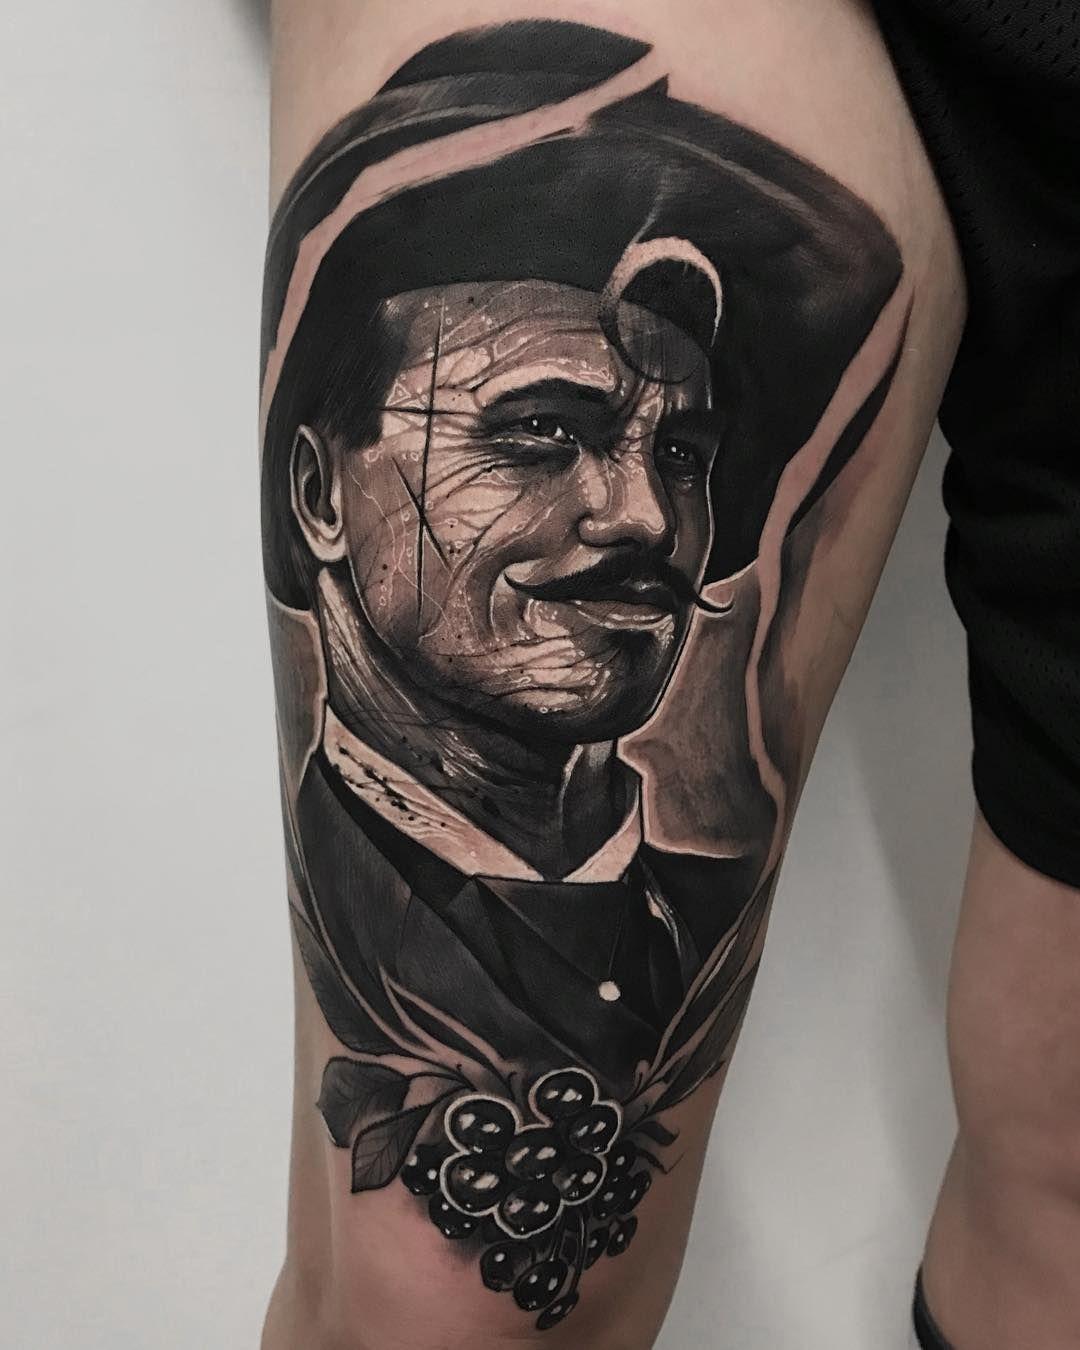 Tattooed Patient His Doc